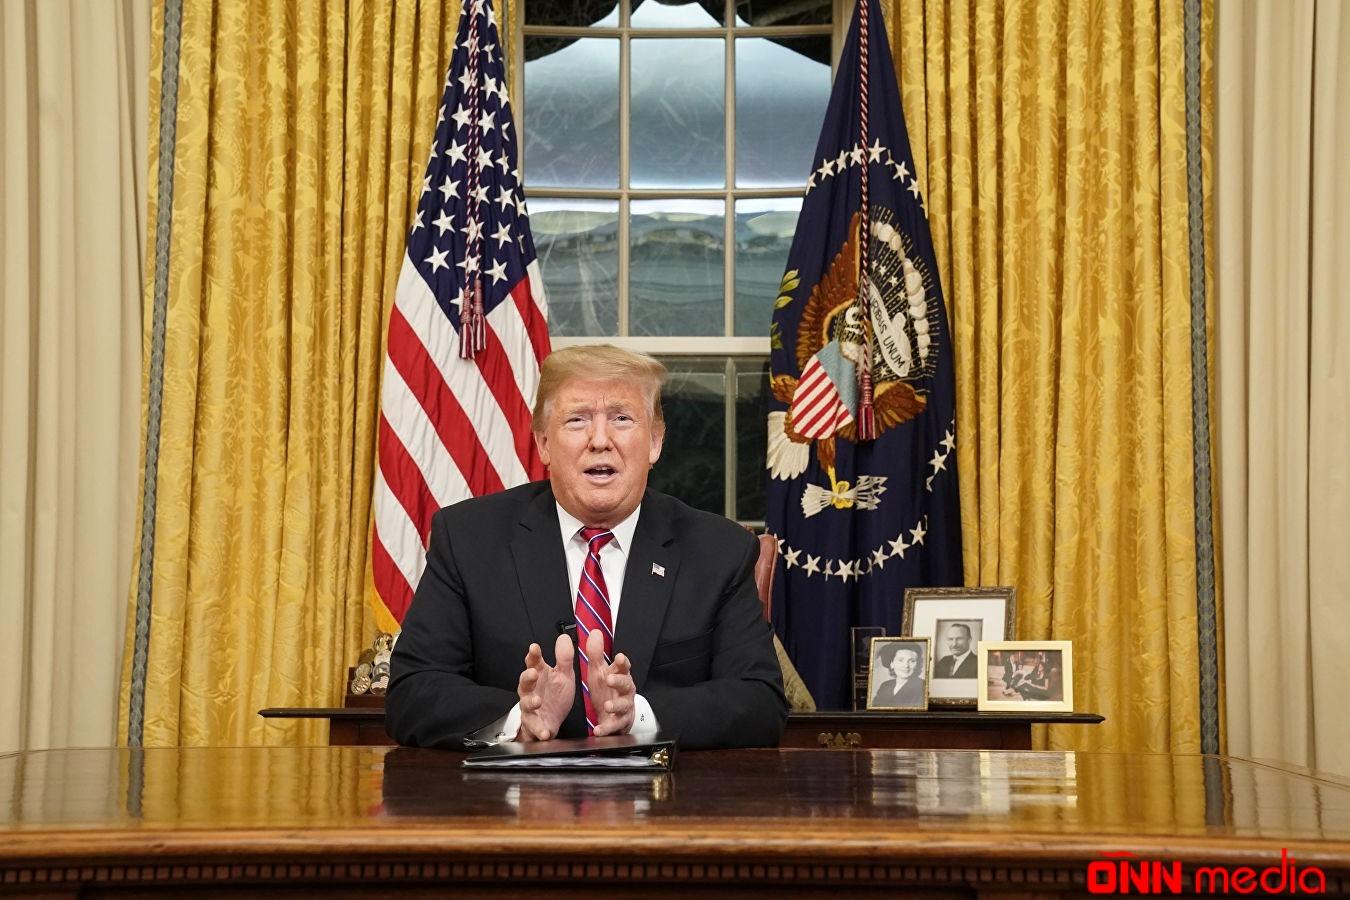 Trampdan amerikalılara çağırış